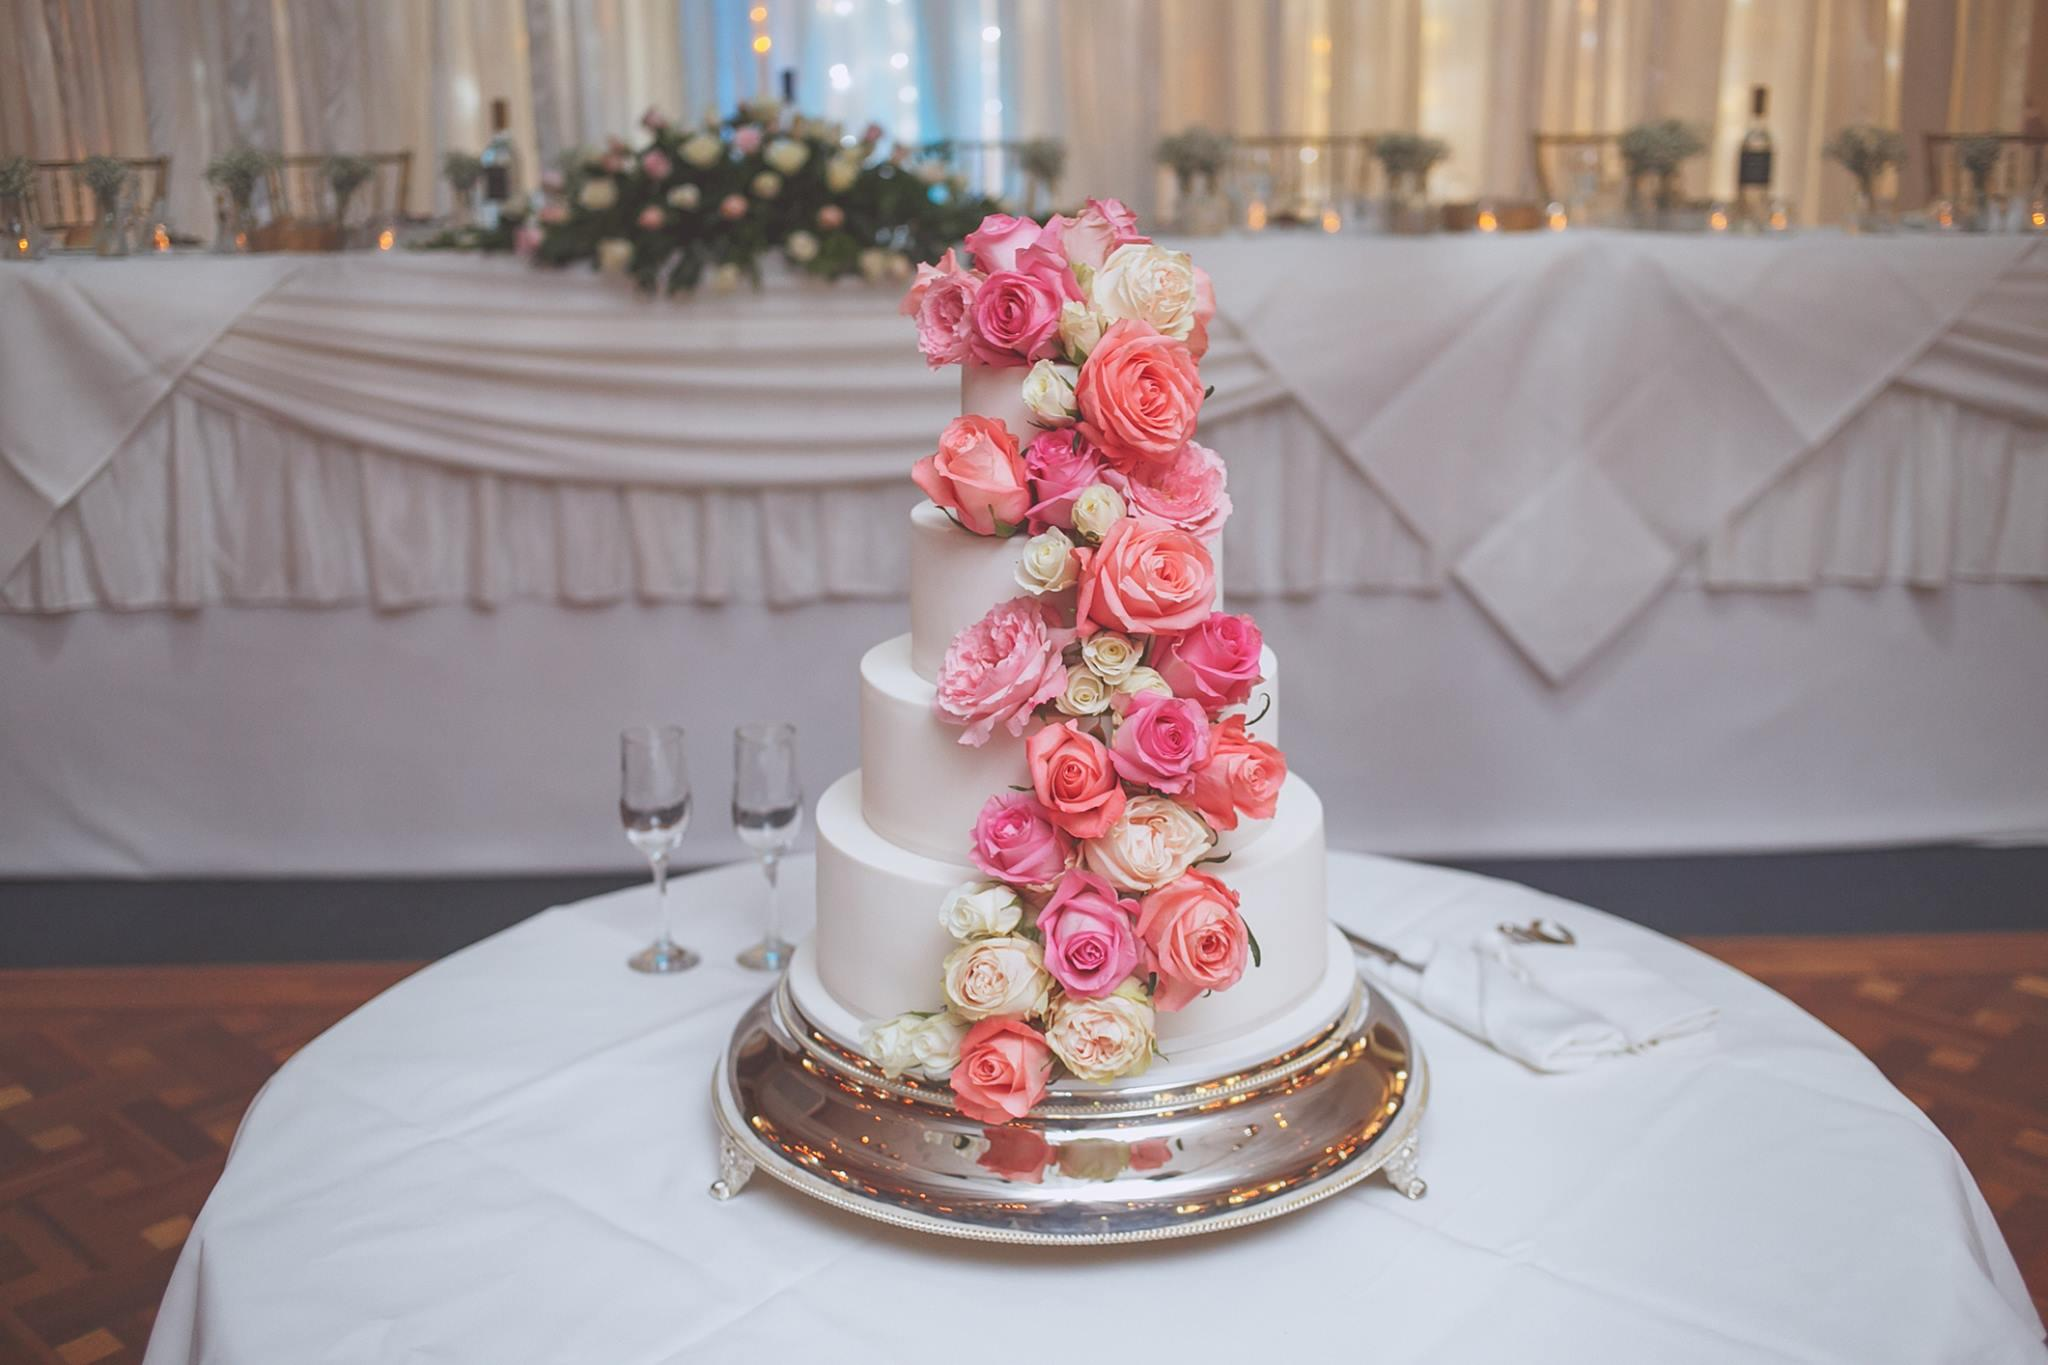 Wedding Cakes by Tammy Allen image 29